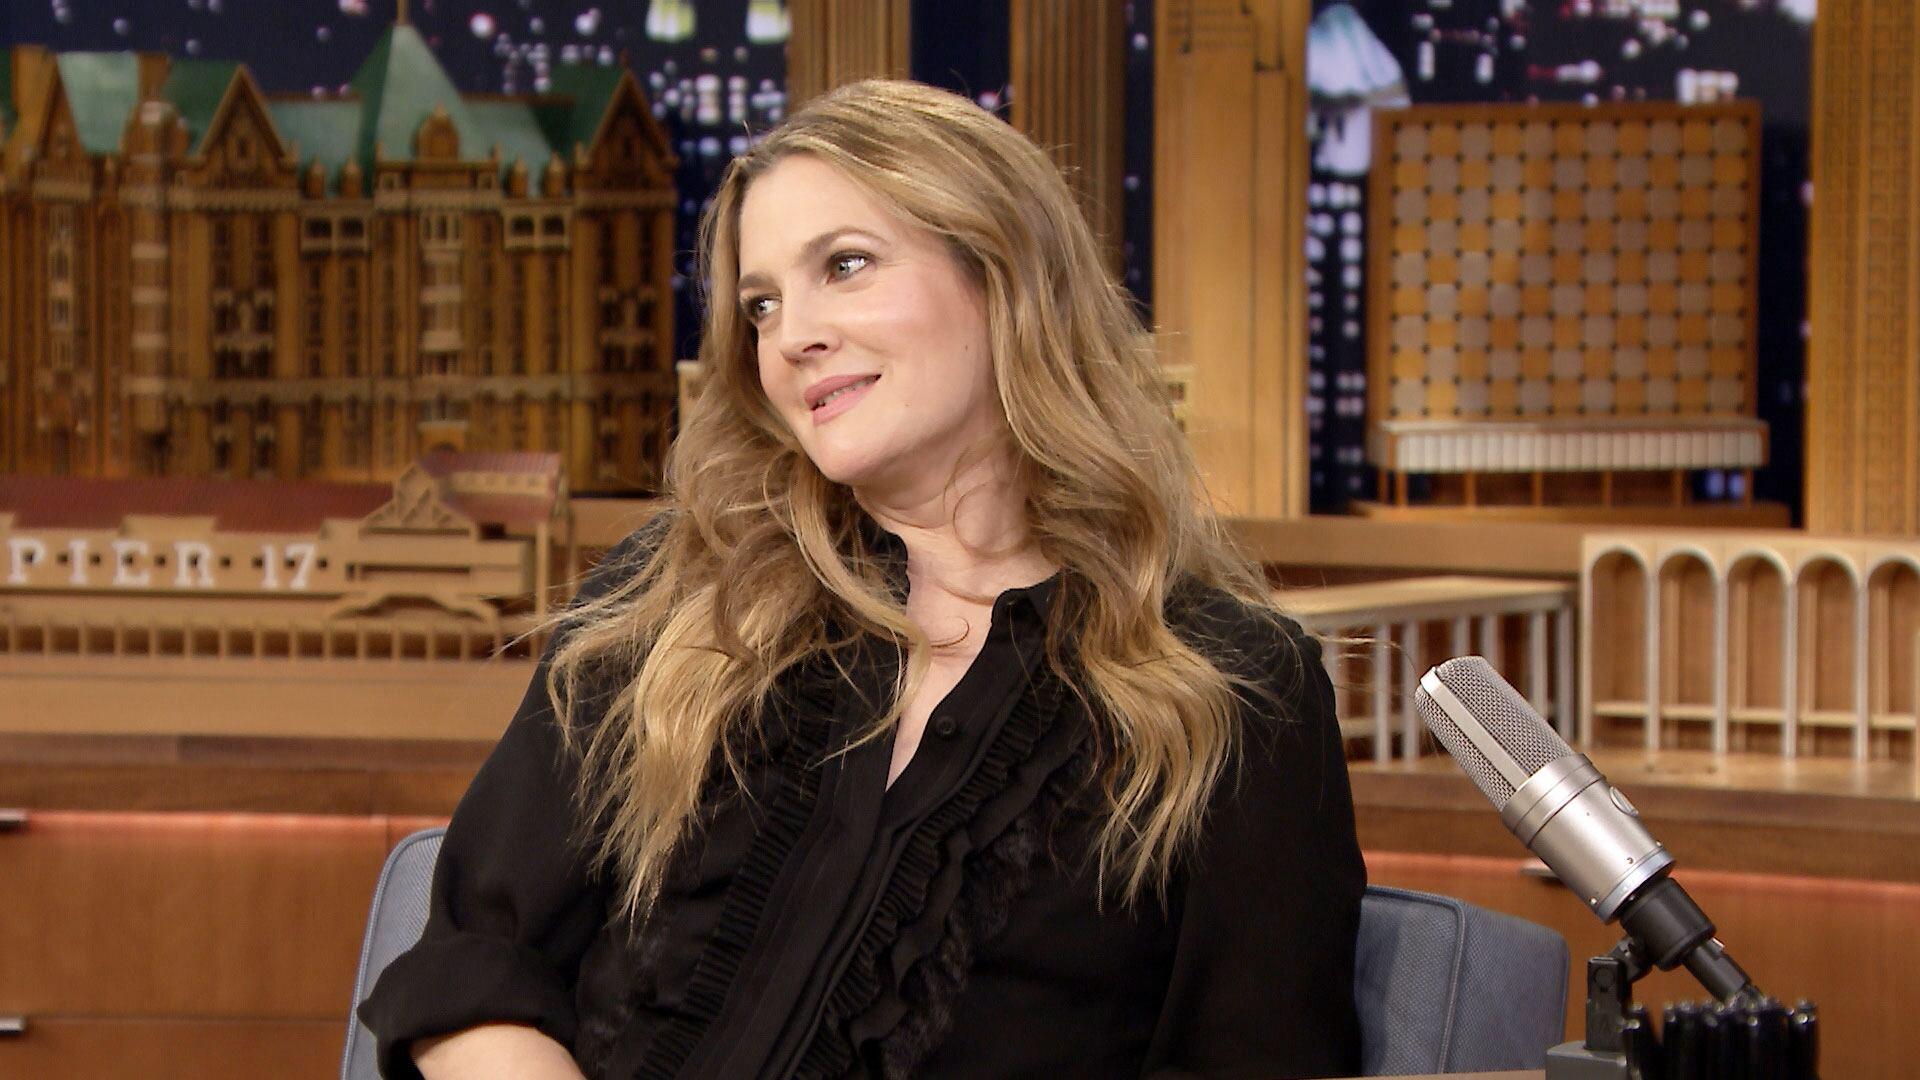 Drew Barrymore Is a Big Fan of Fanny Packs and SZA